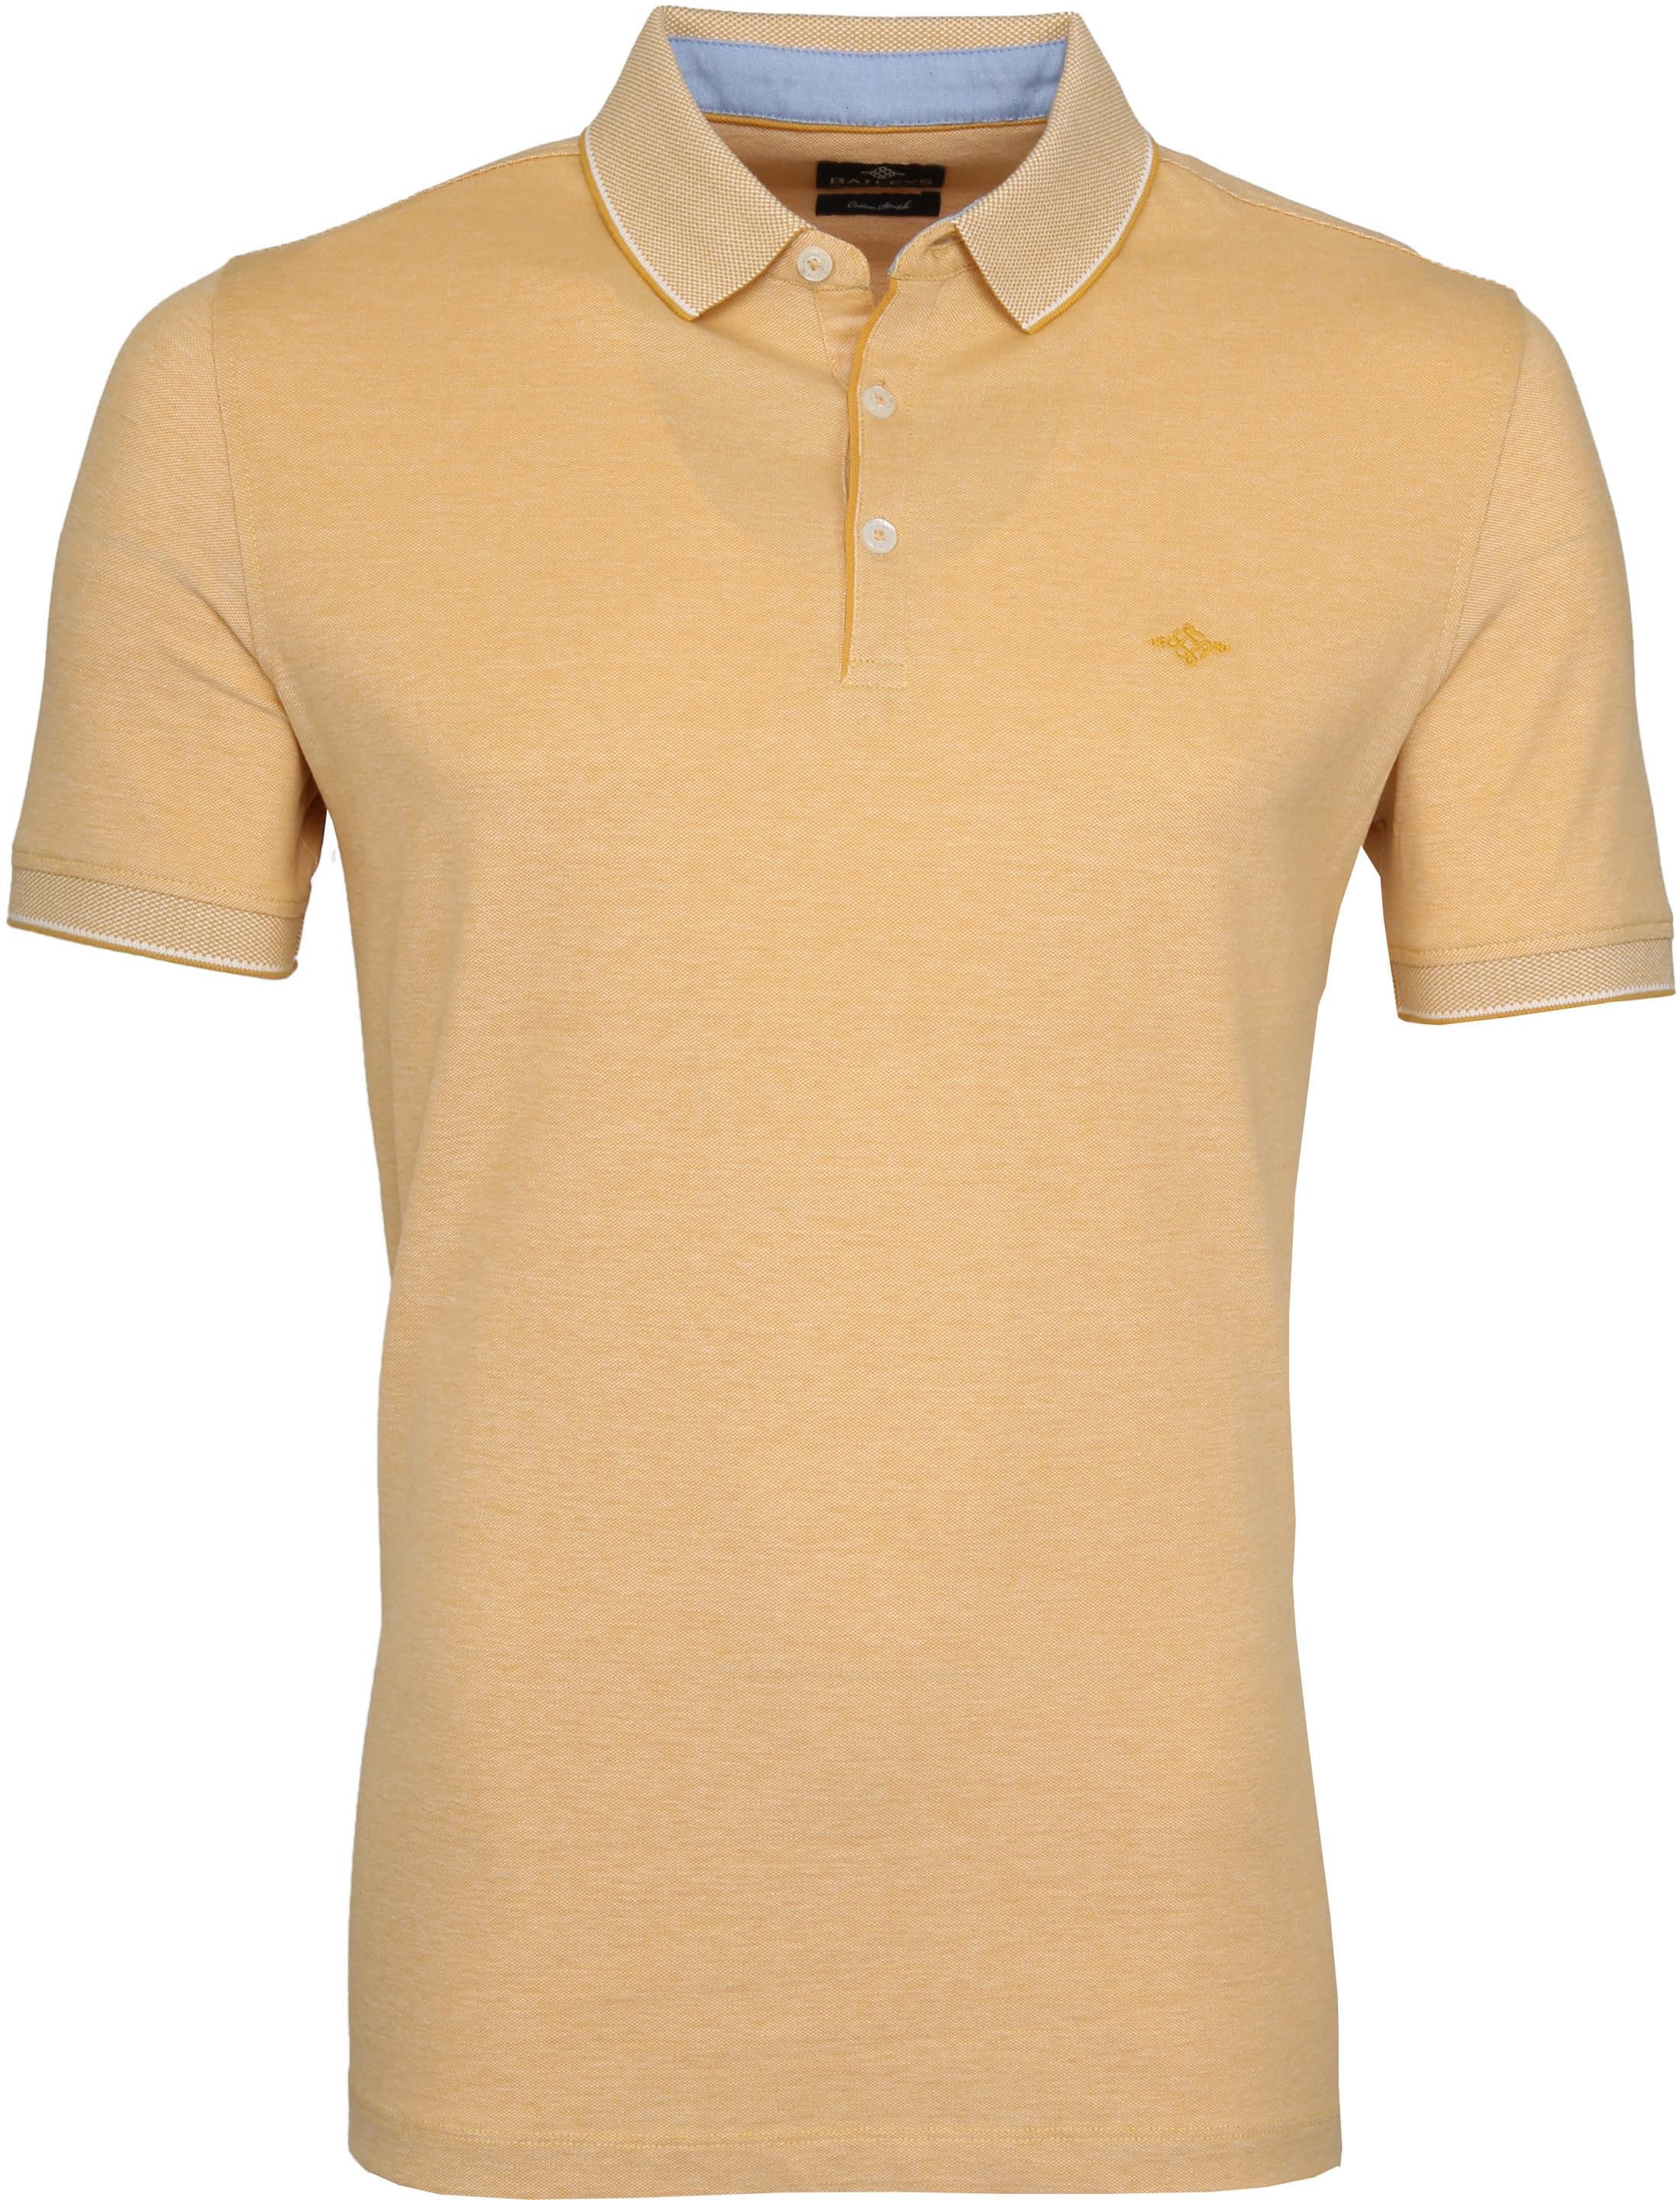 Suitable Melange Poloshirt Yellow foto 0